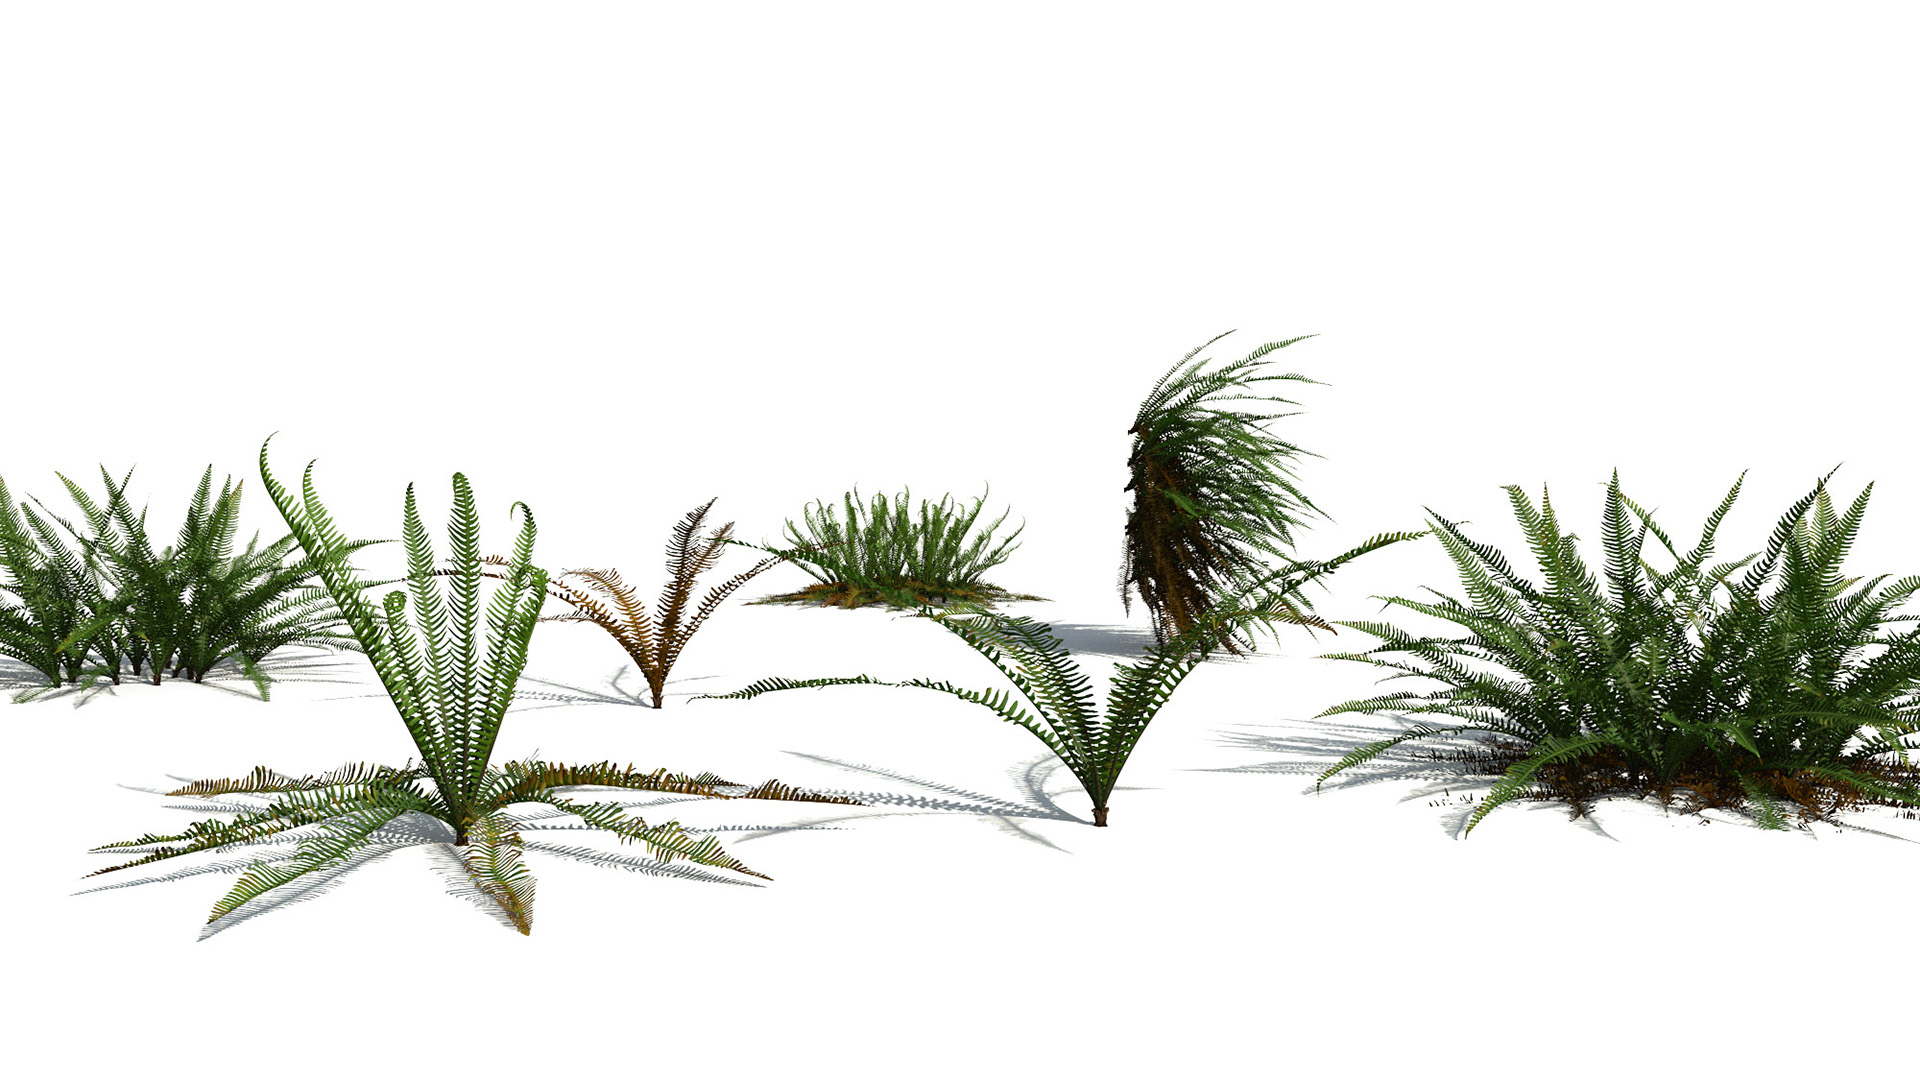 3D model of the Deer fern Blechnum spicant different presets